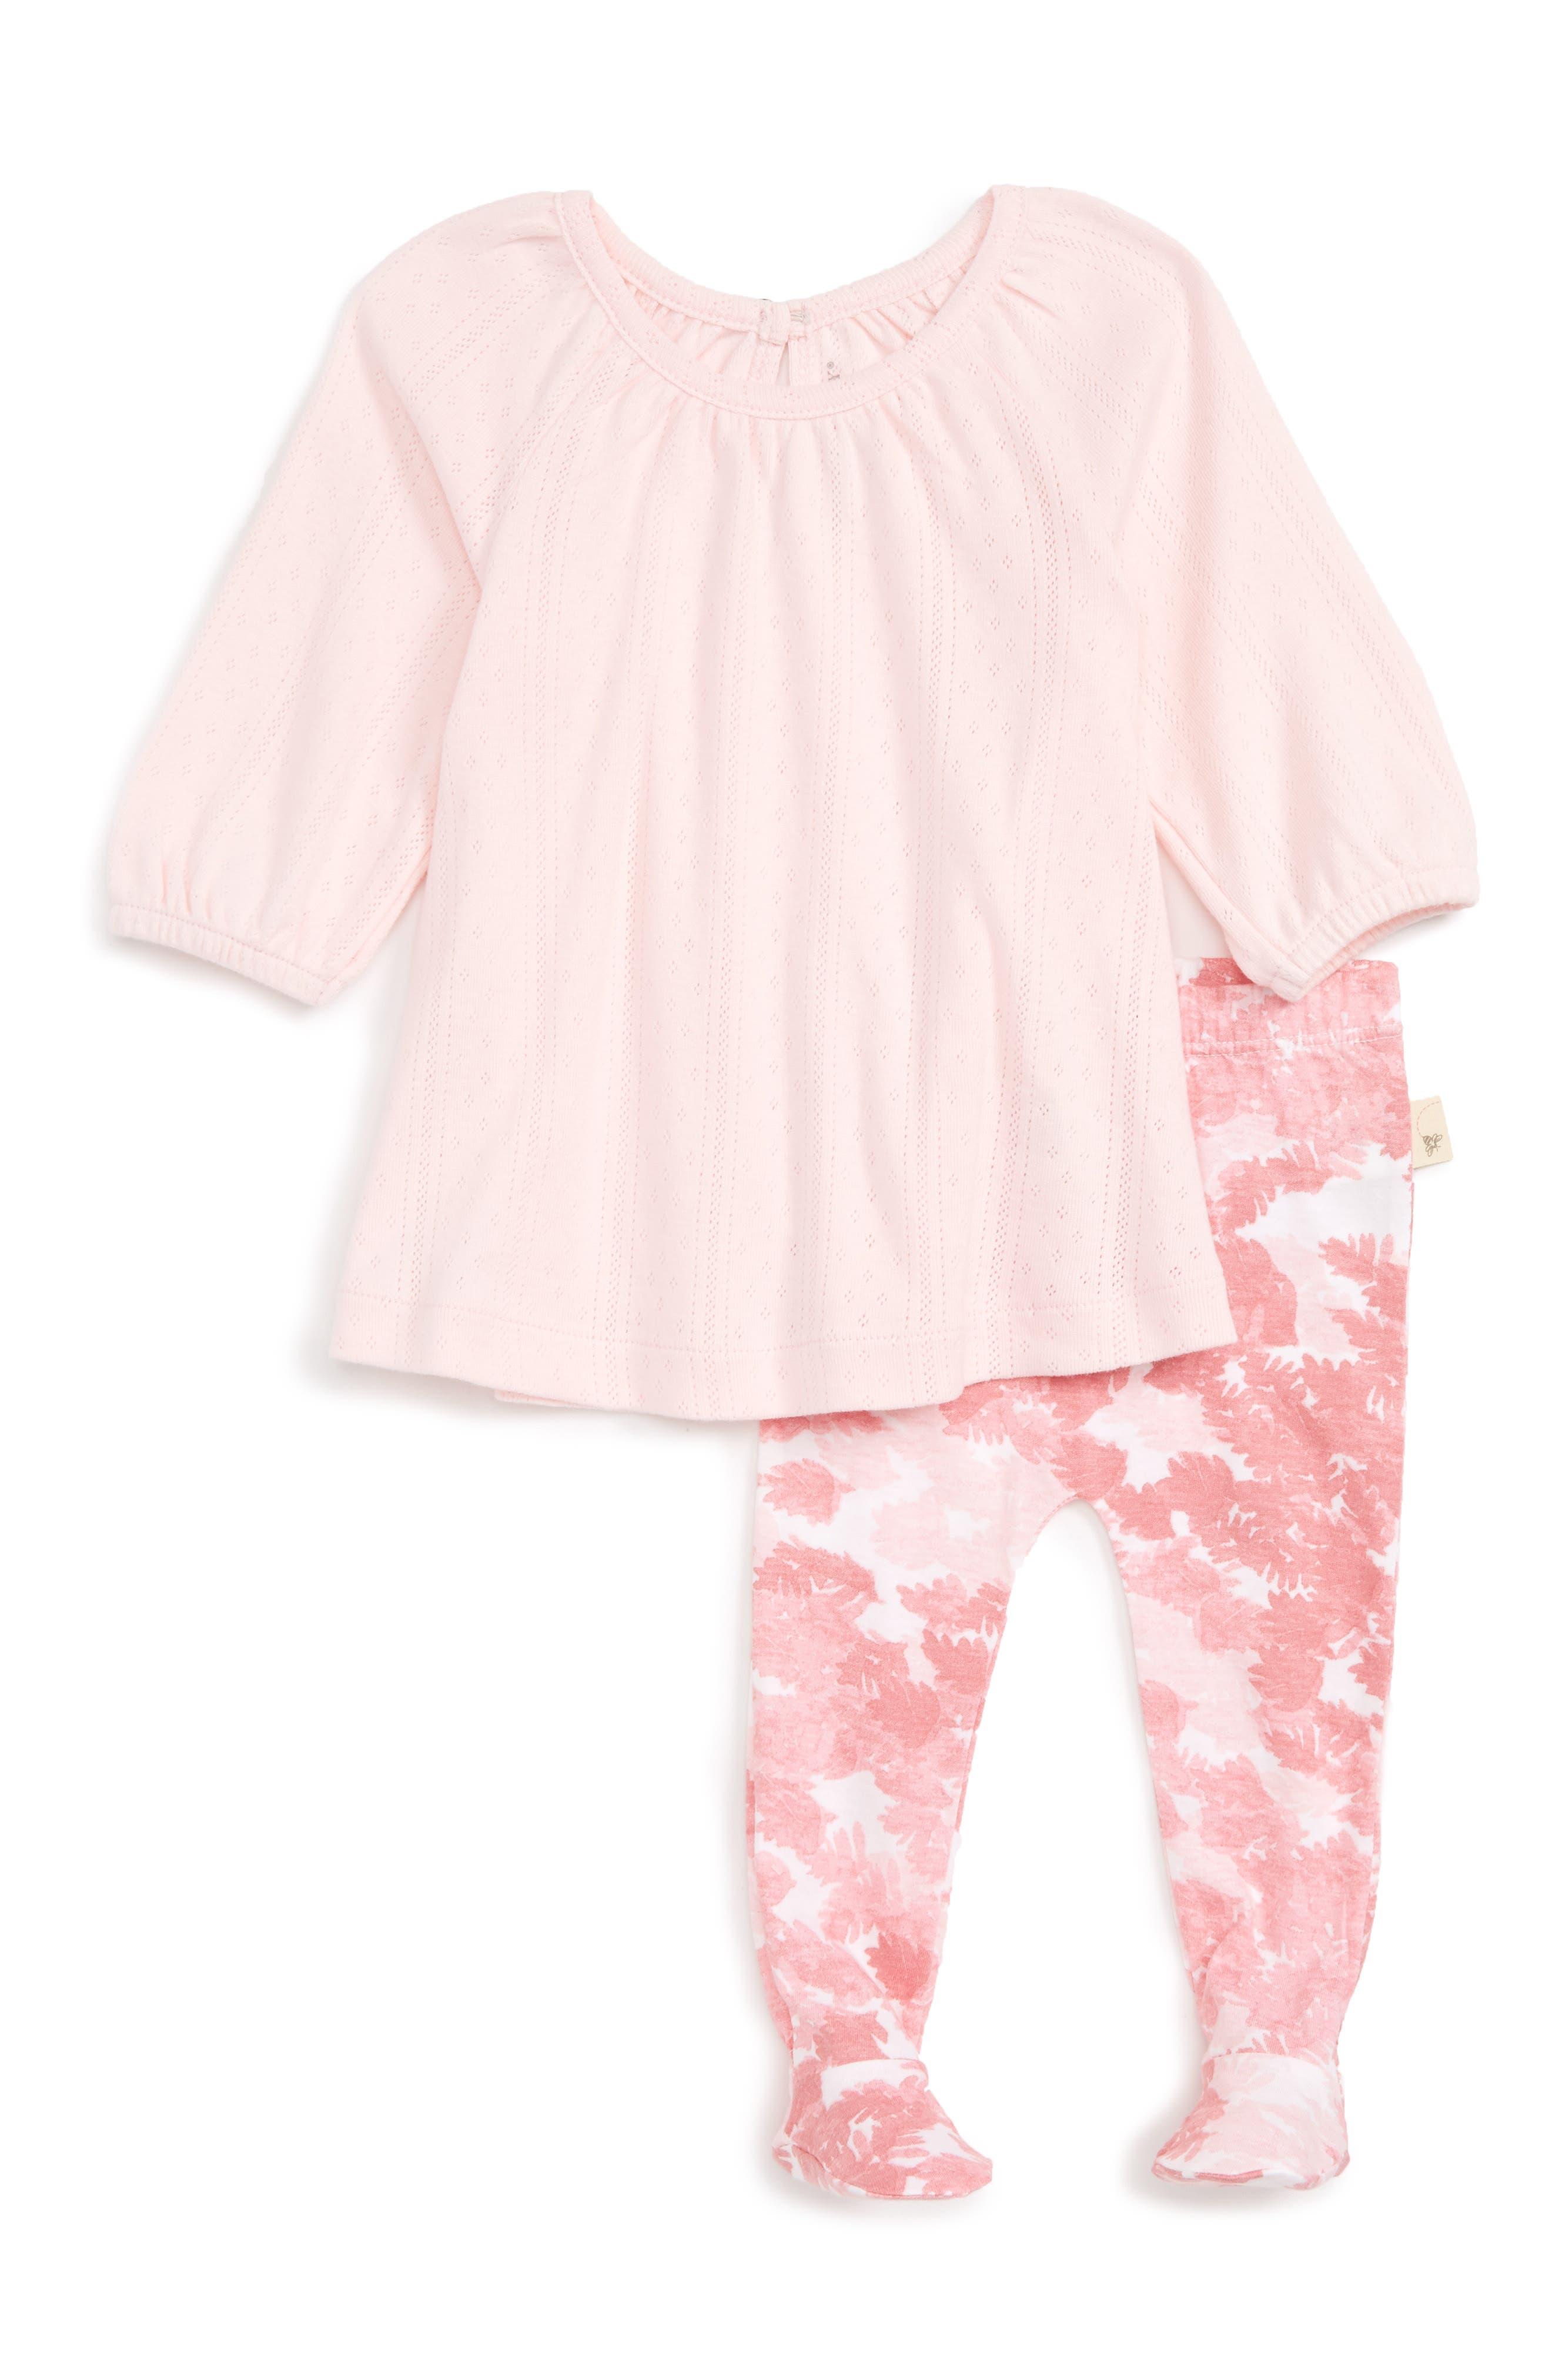 Main Image - Burt's Bees Baby Pointelle Organic Cotton Dress & Footed Leggings Set (Baby Girls)